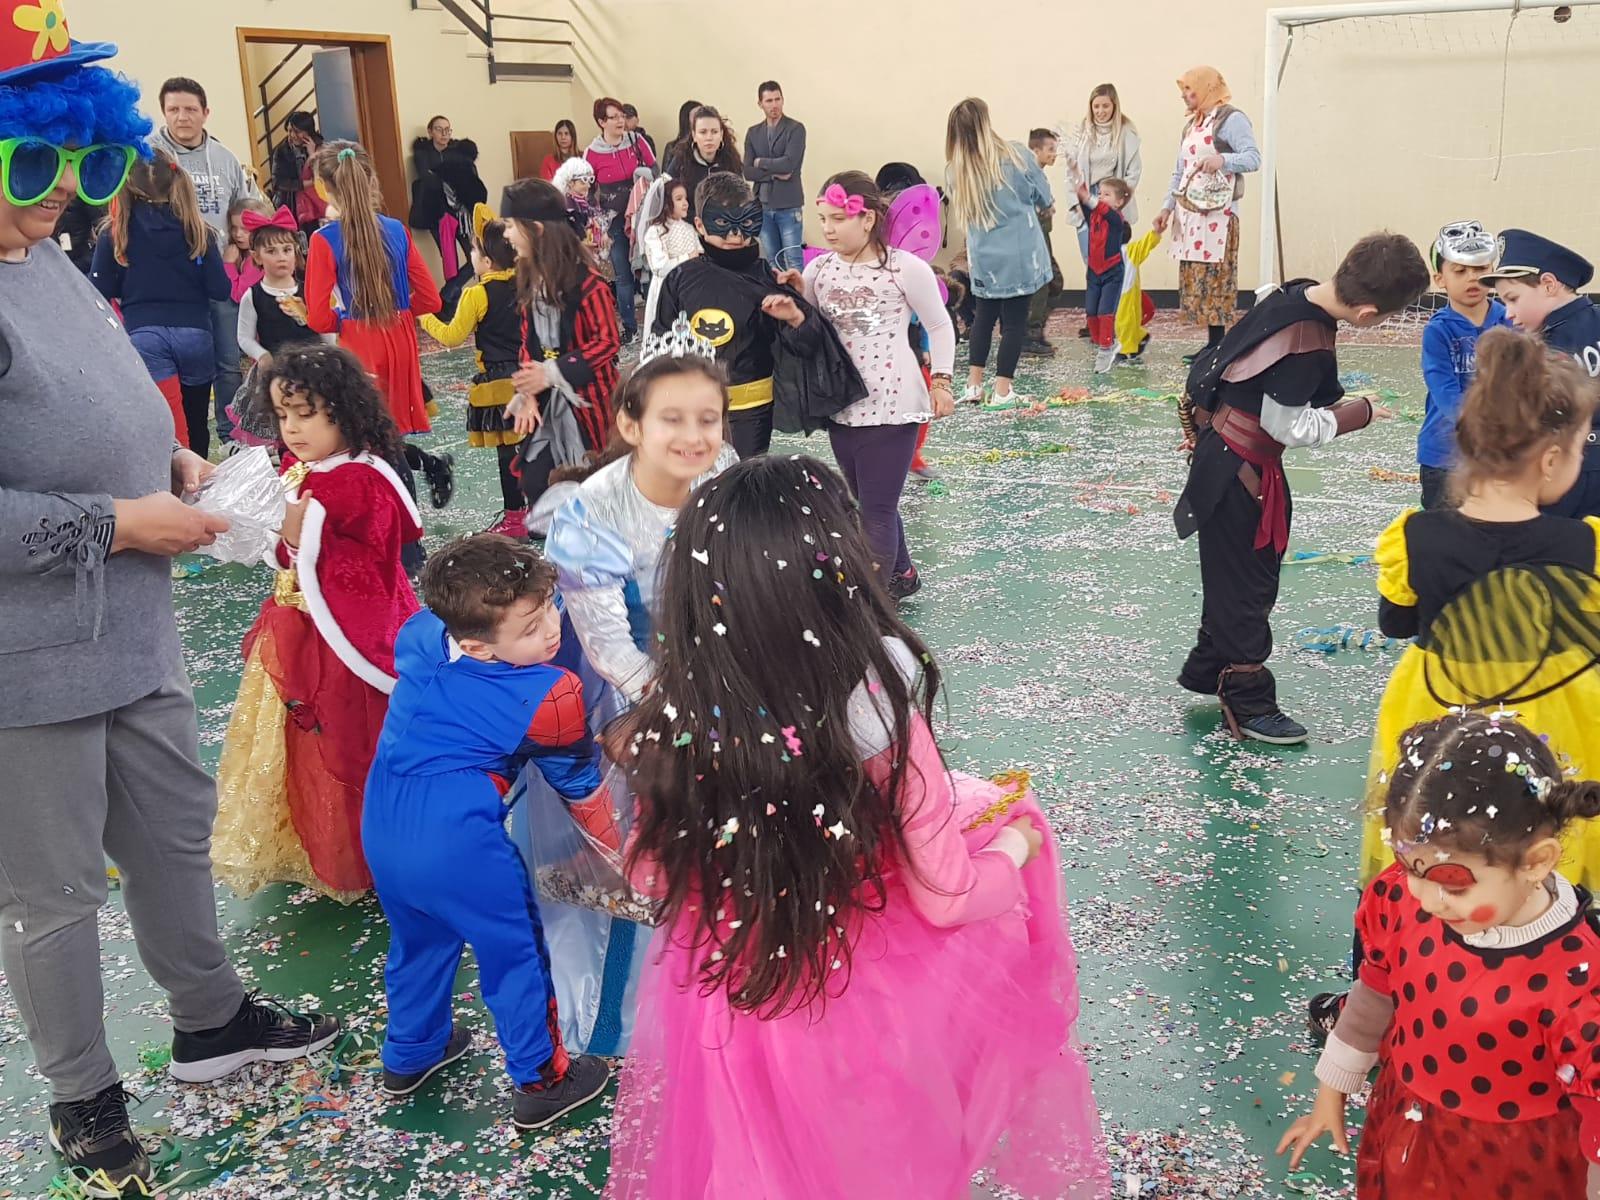 Baraonda Carnevale 2019 (68)